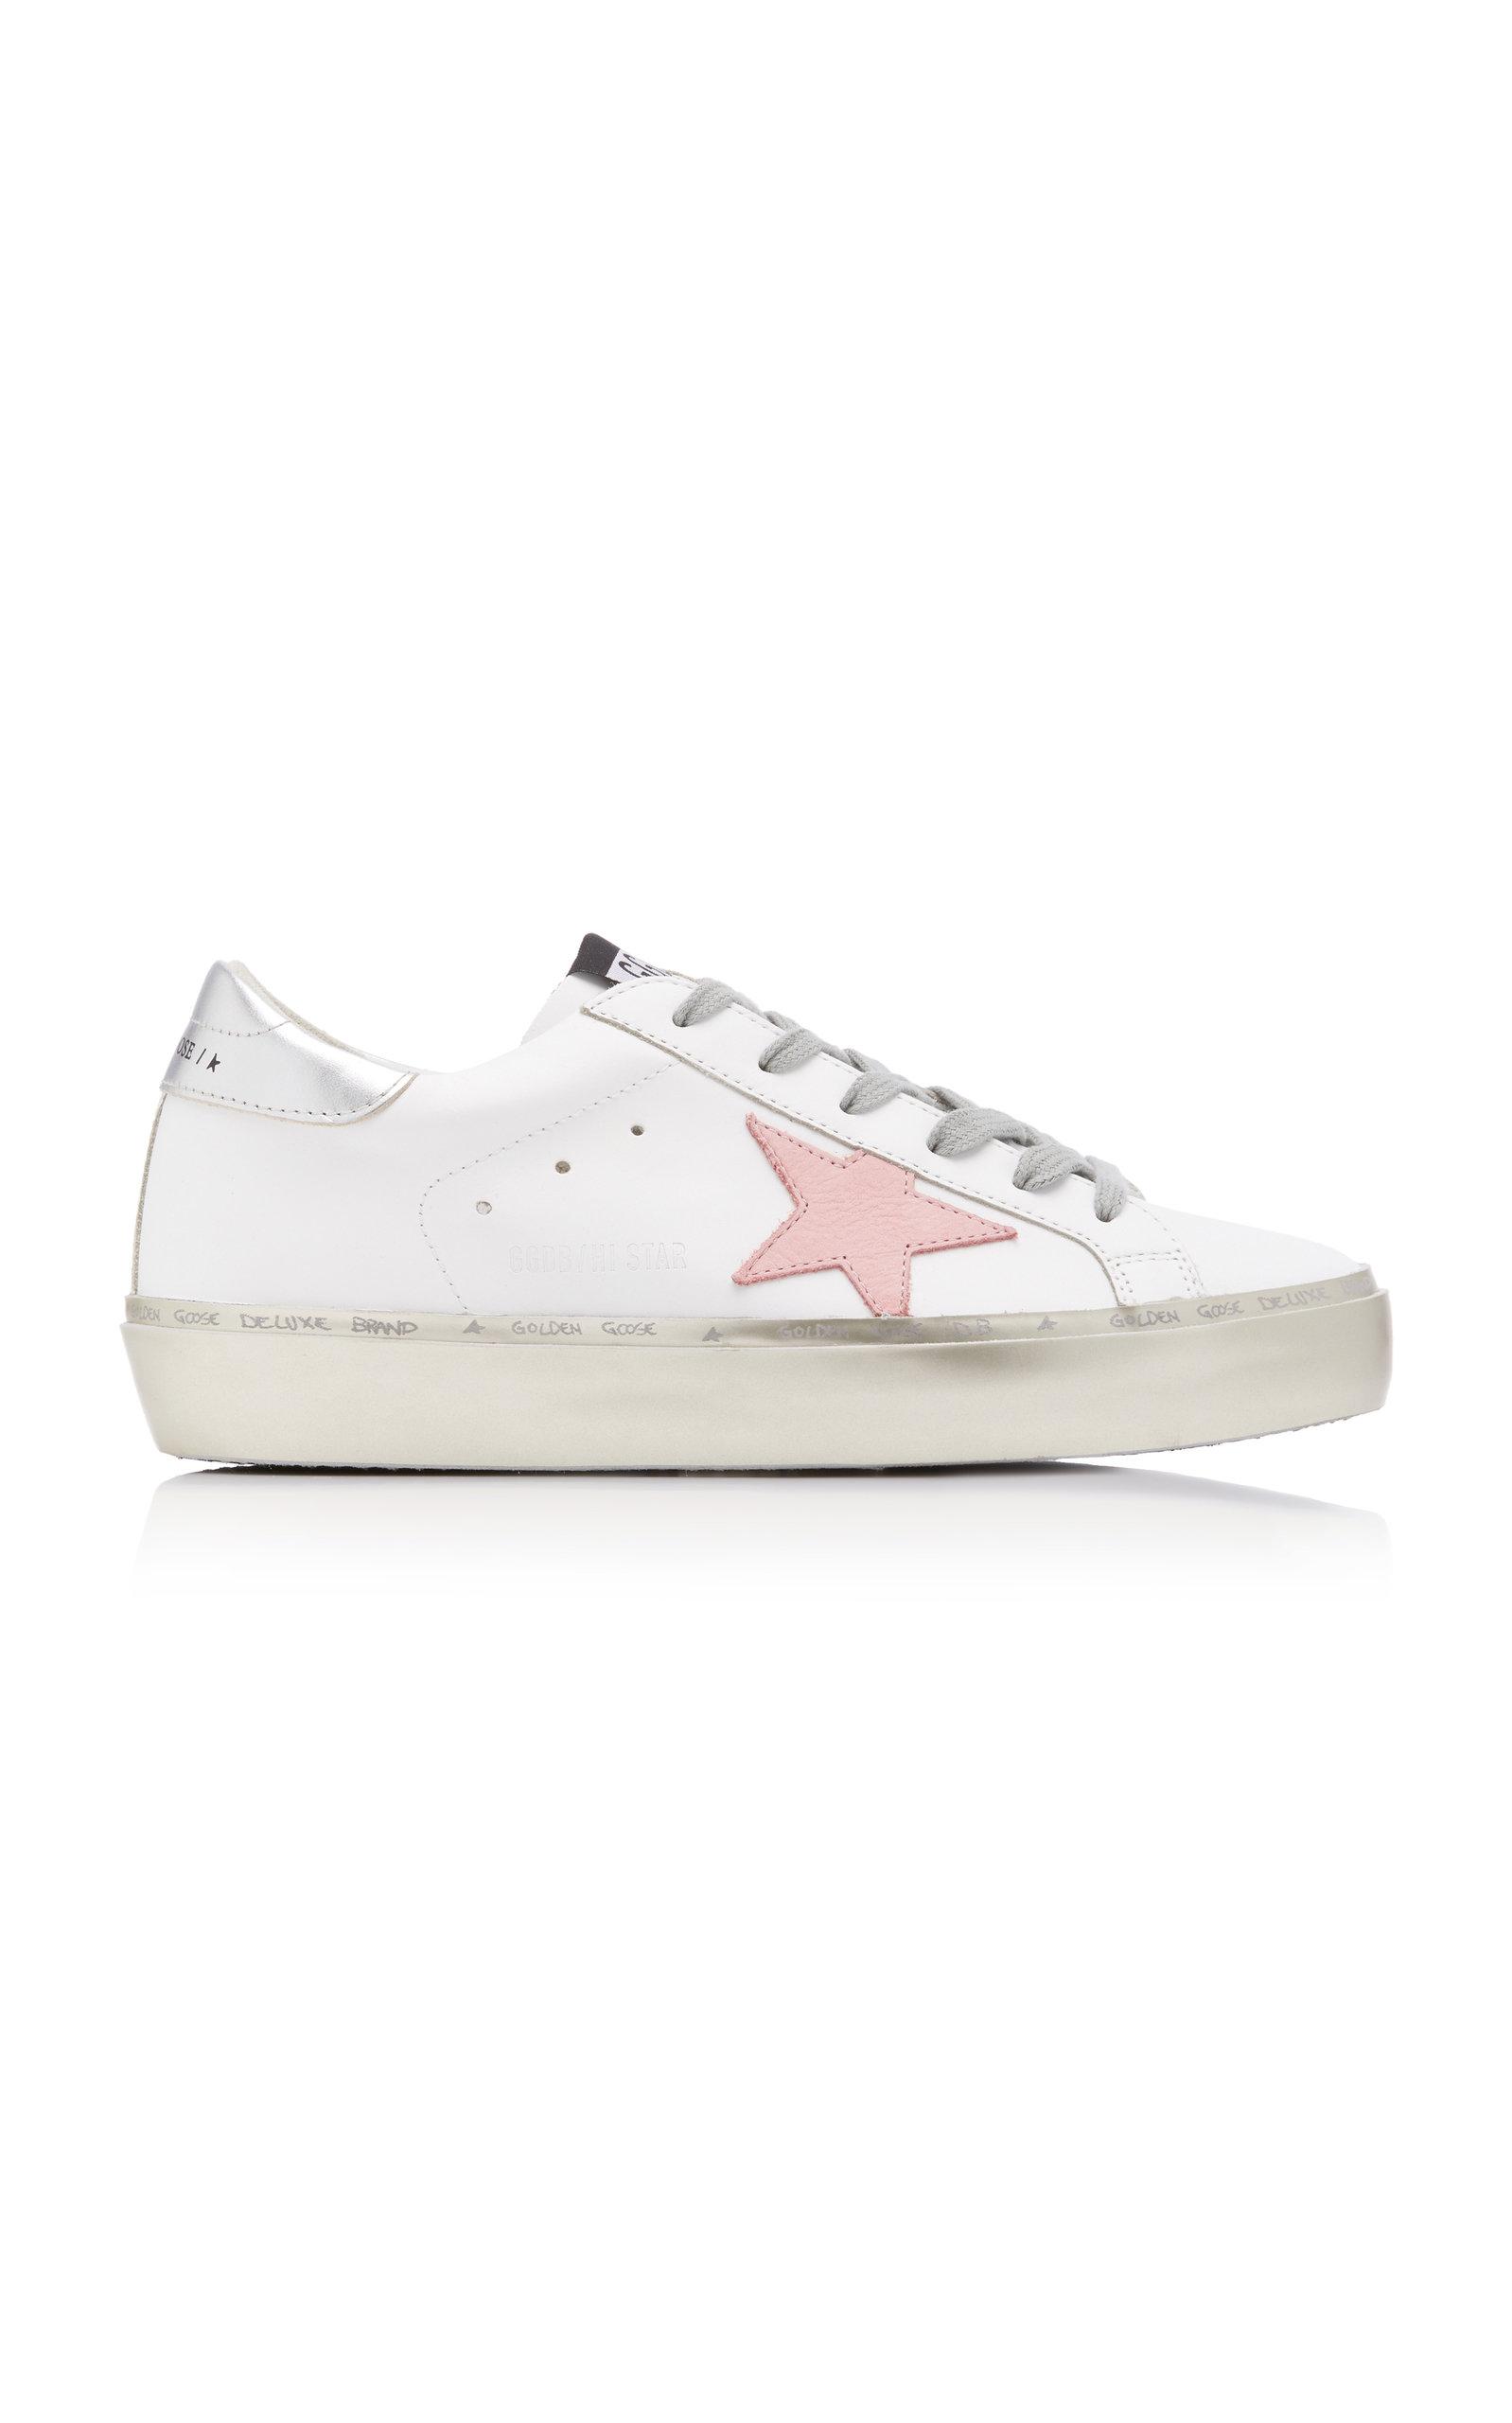 Golden Goose - Women's Hi Star Platform Leather Sneakers - White - Moda Operandi